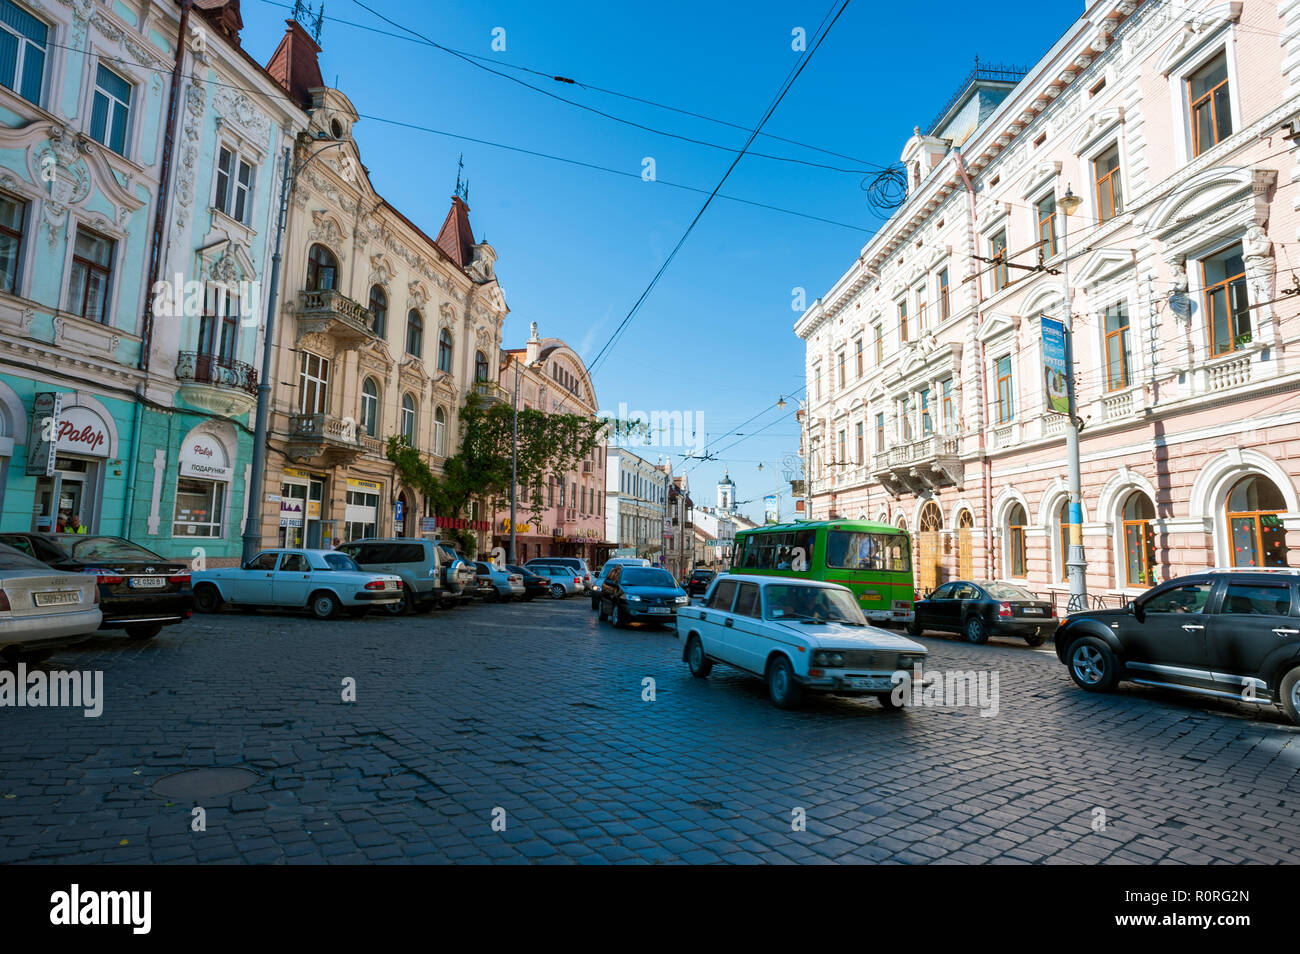 A street scene in Chernivtsi, a superb example of Austro-Hungarian Empire architecture in western Ukraine. - Stock Image